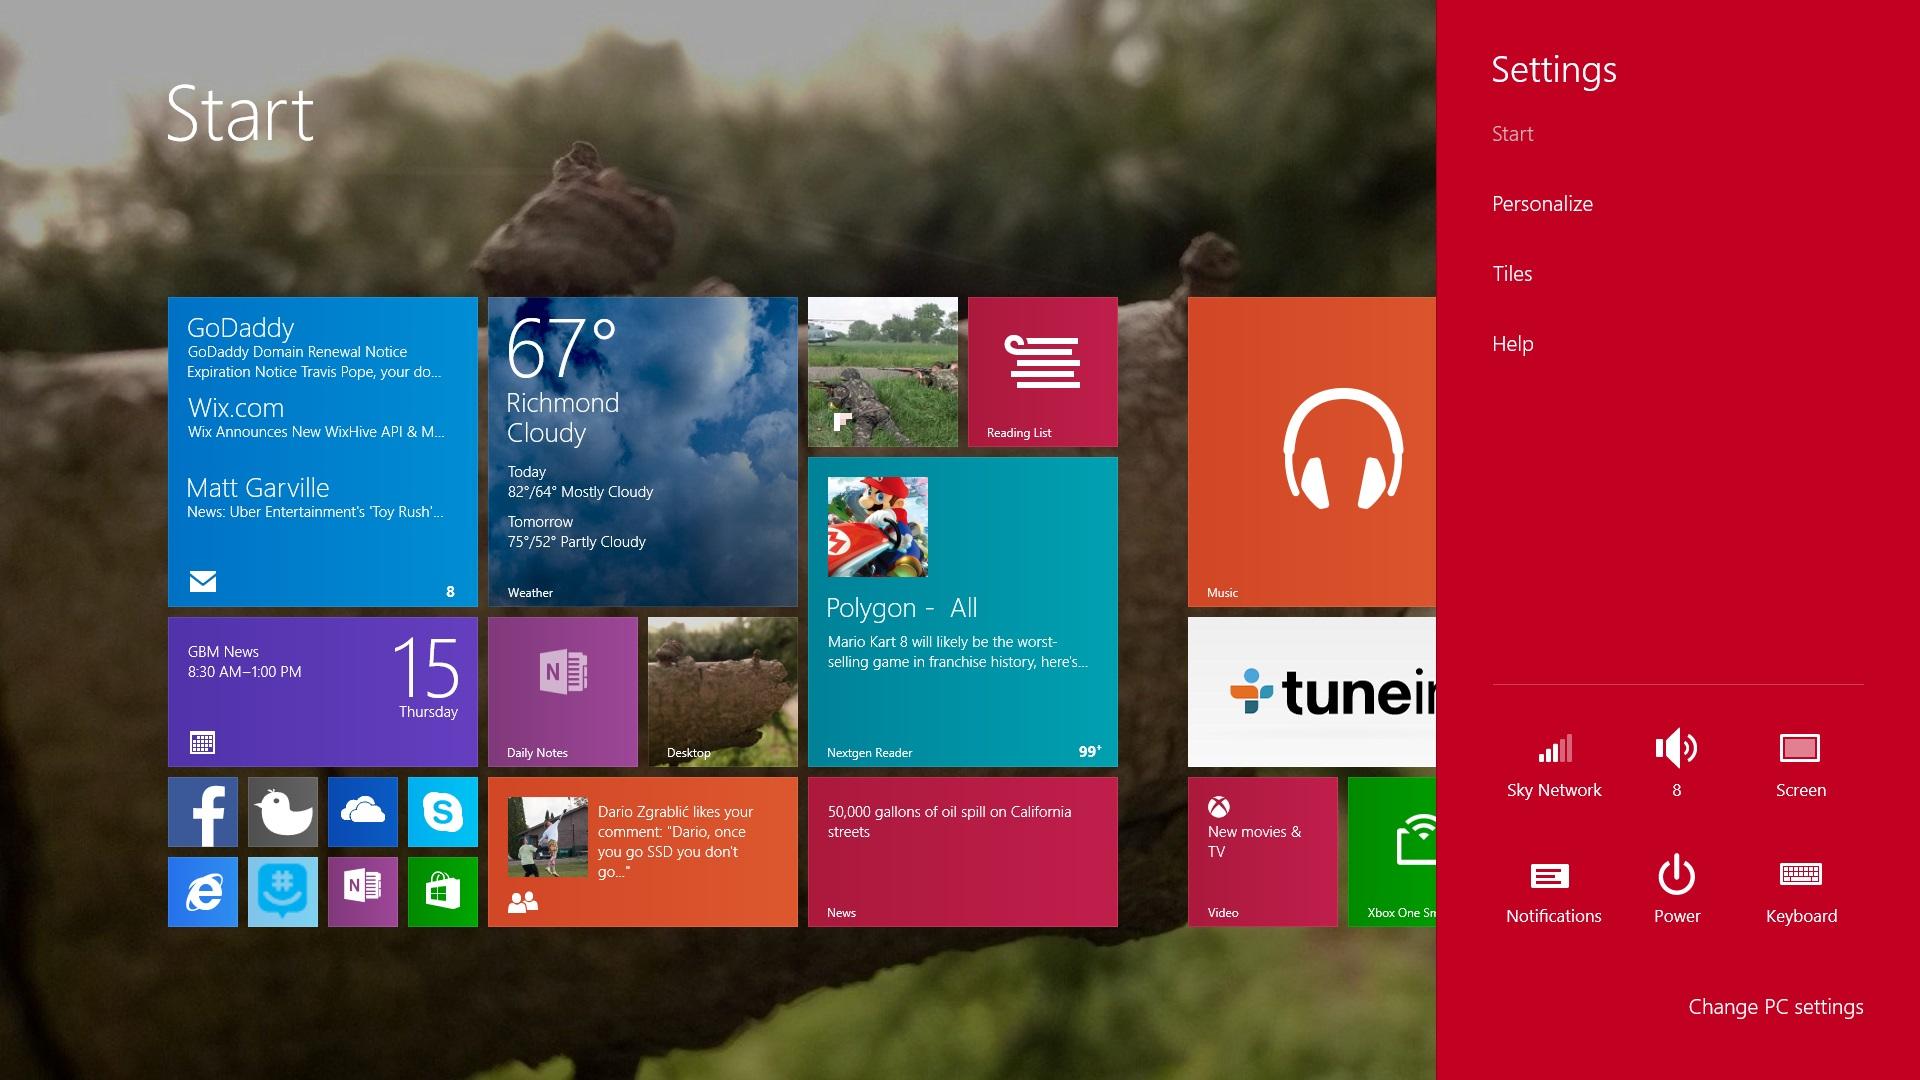 Windows 81 Lock Screen Wallpaper DiyMidcom 1920x1080